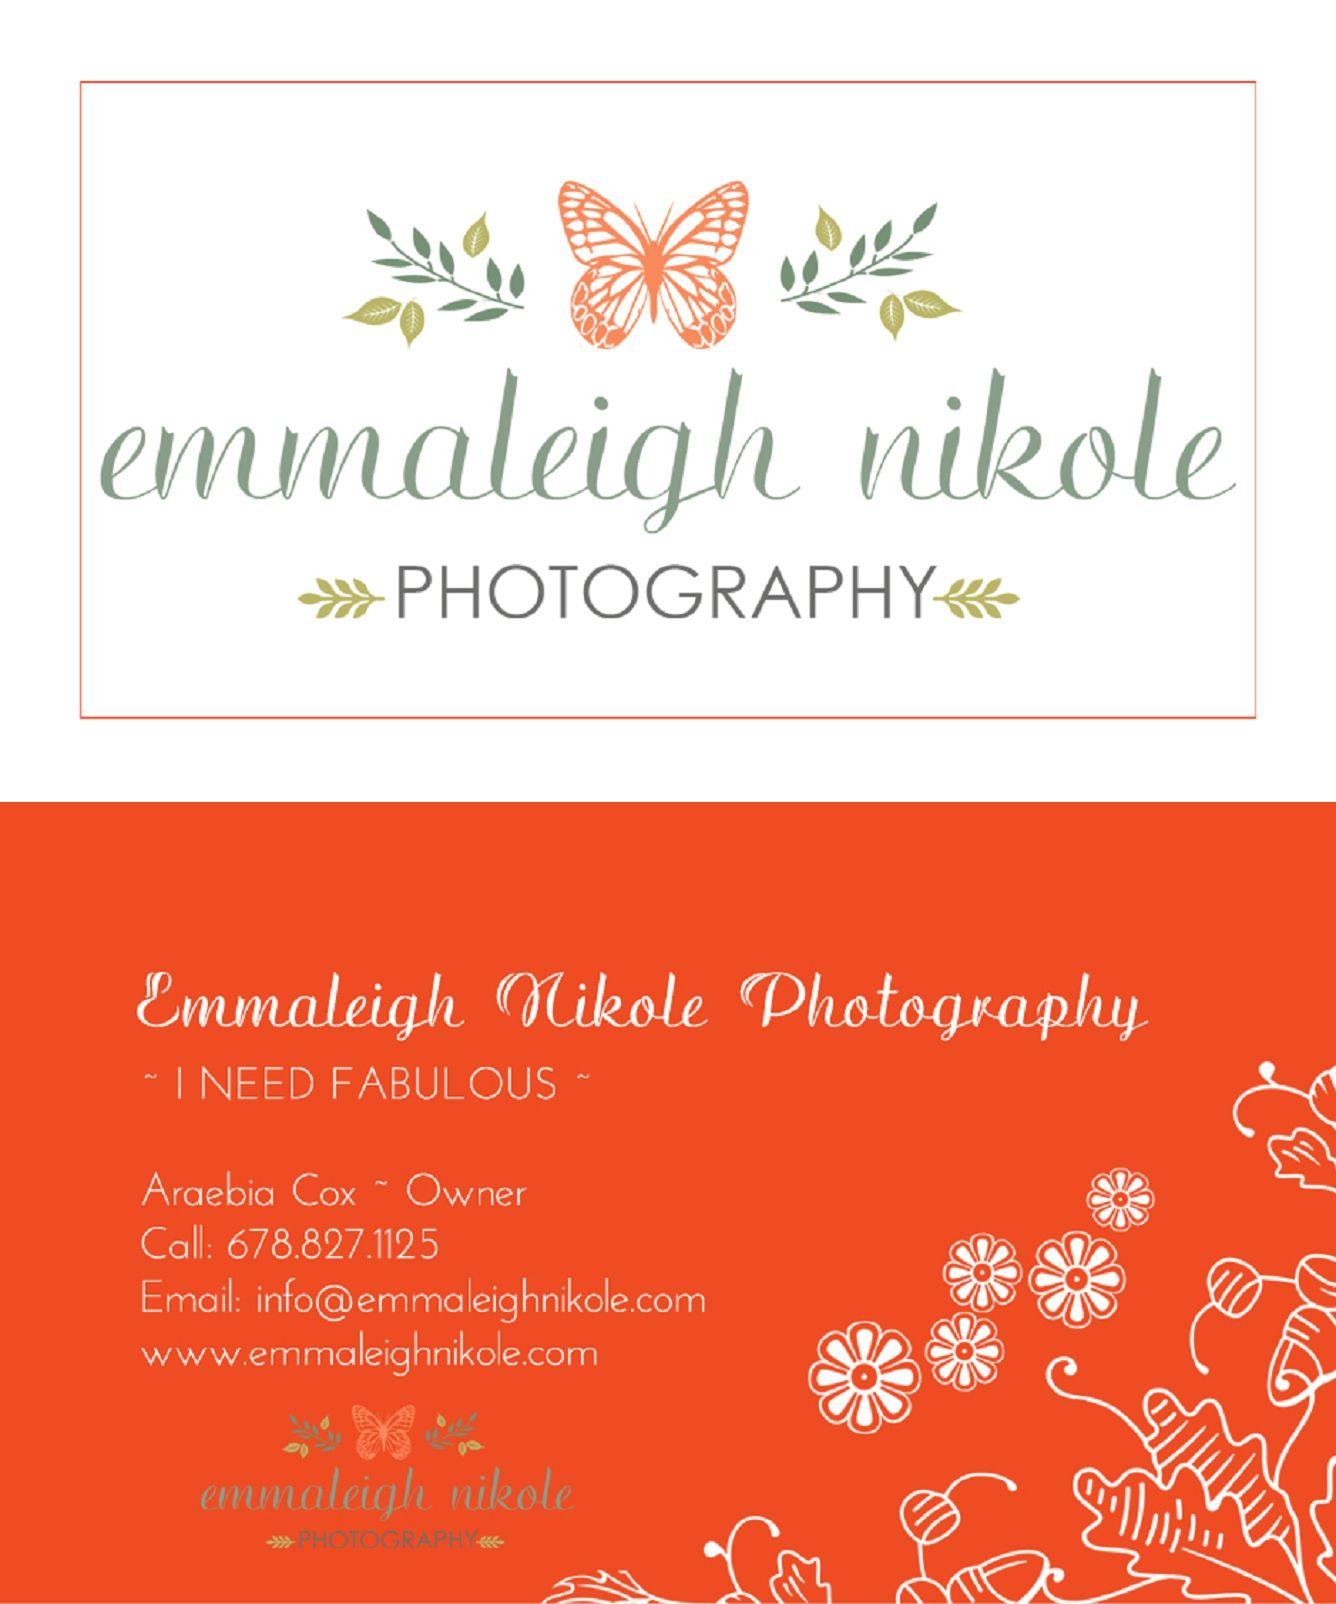 emmaleighnikole business cards lithonia photographer atlanta